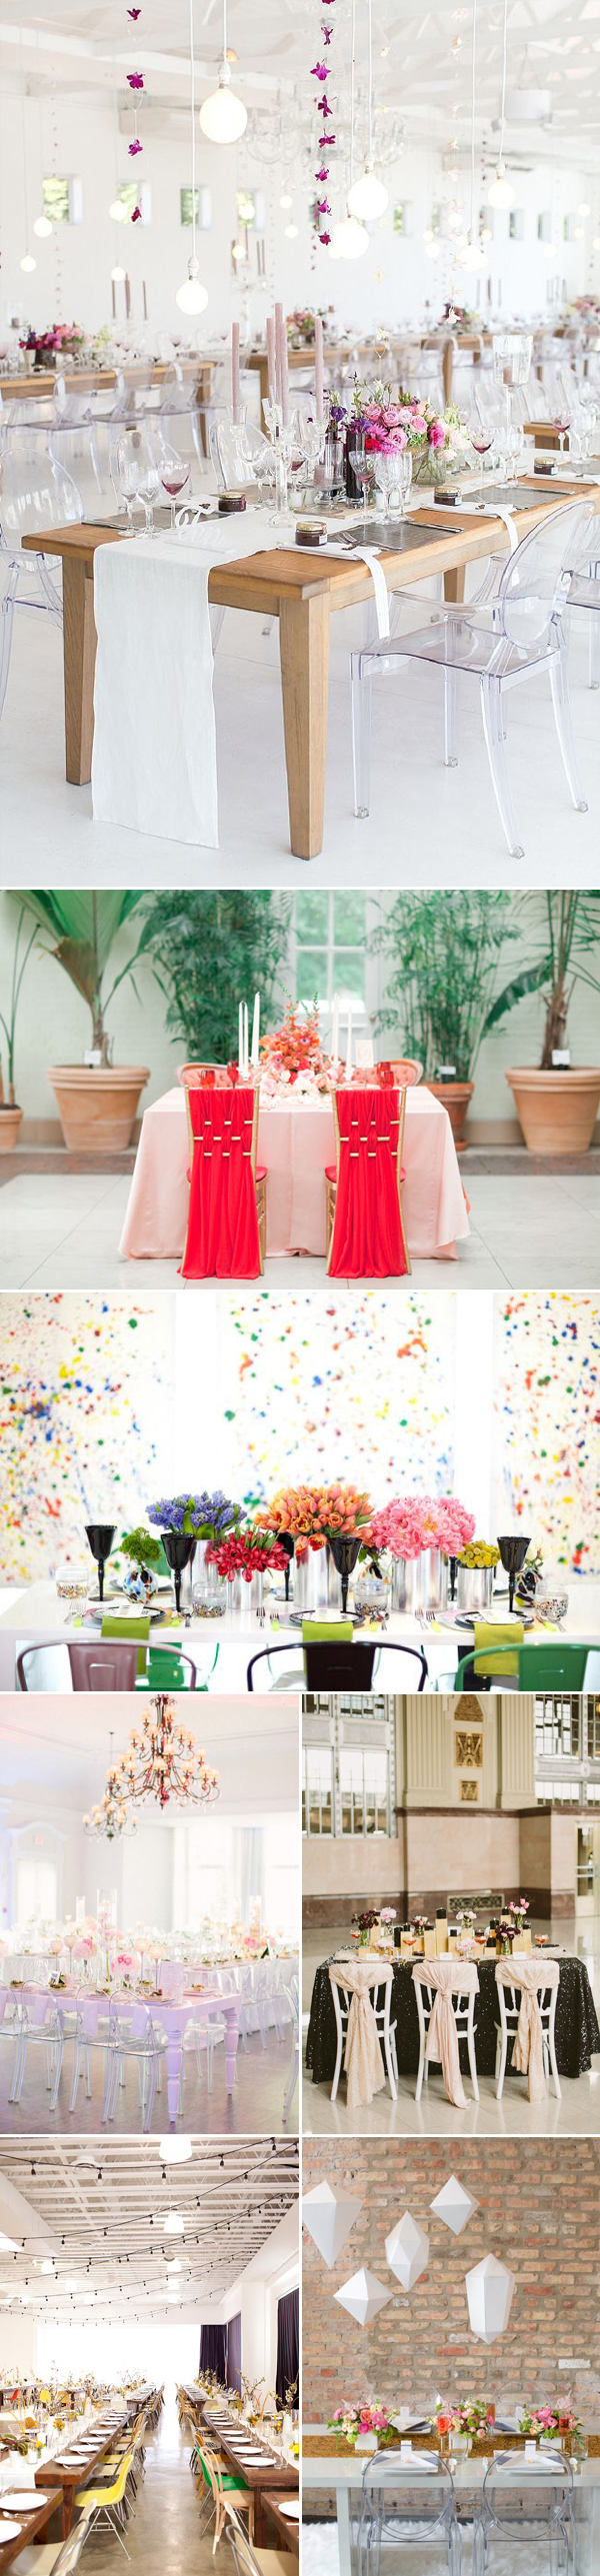 contemporary wedding ideas